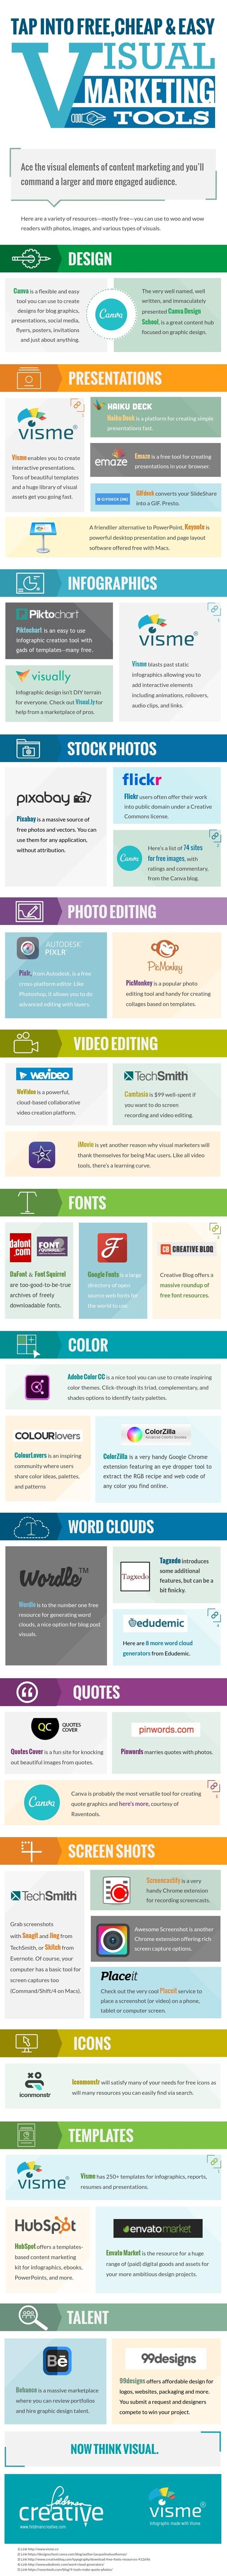 Visual-Marketing-Tools